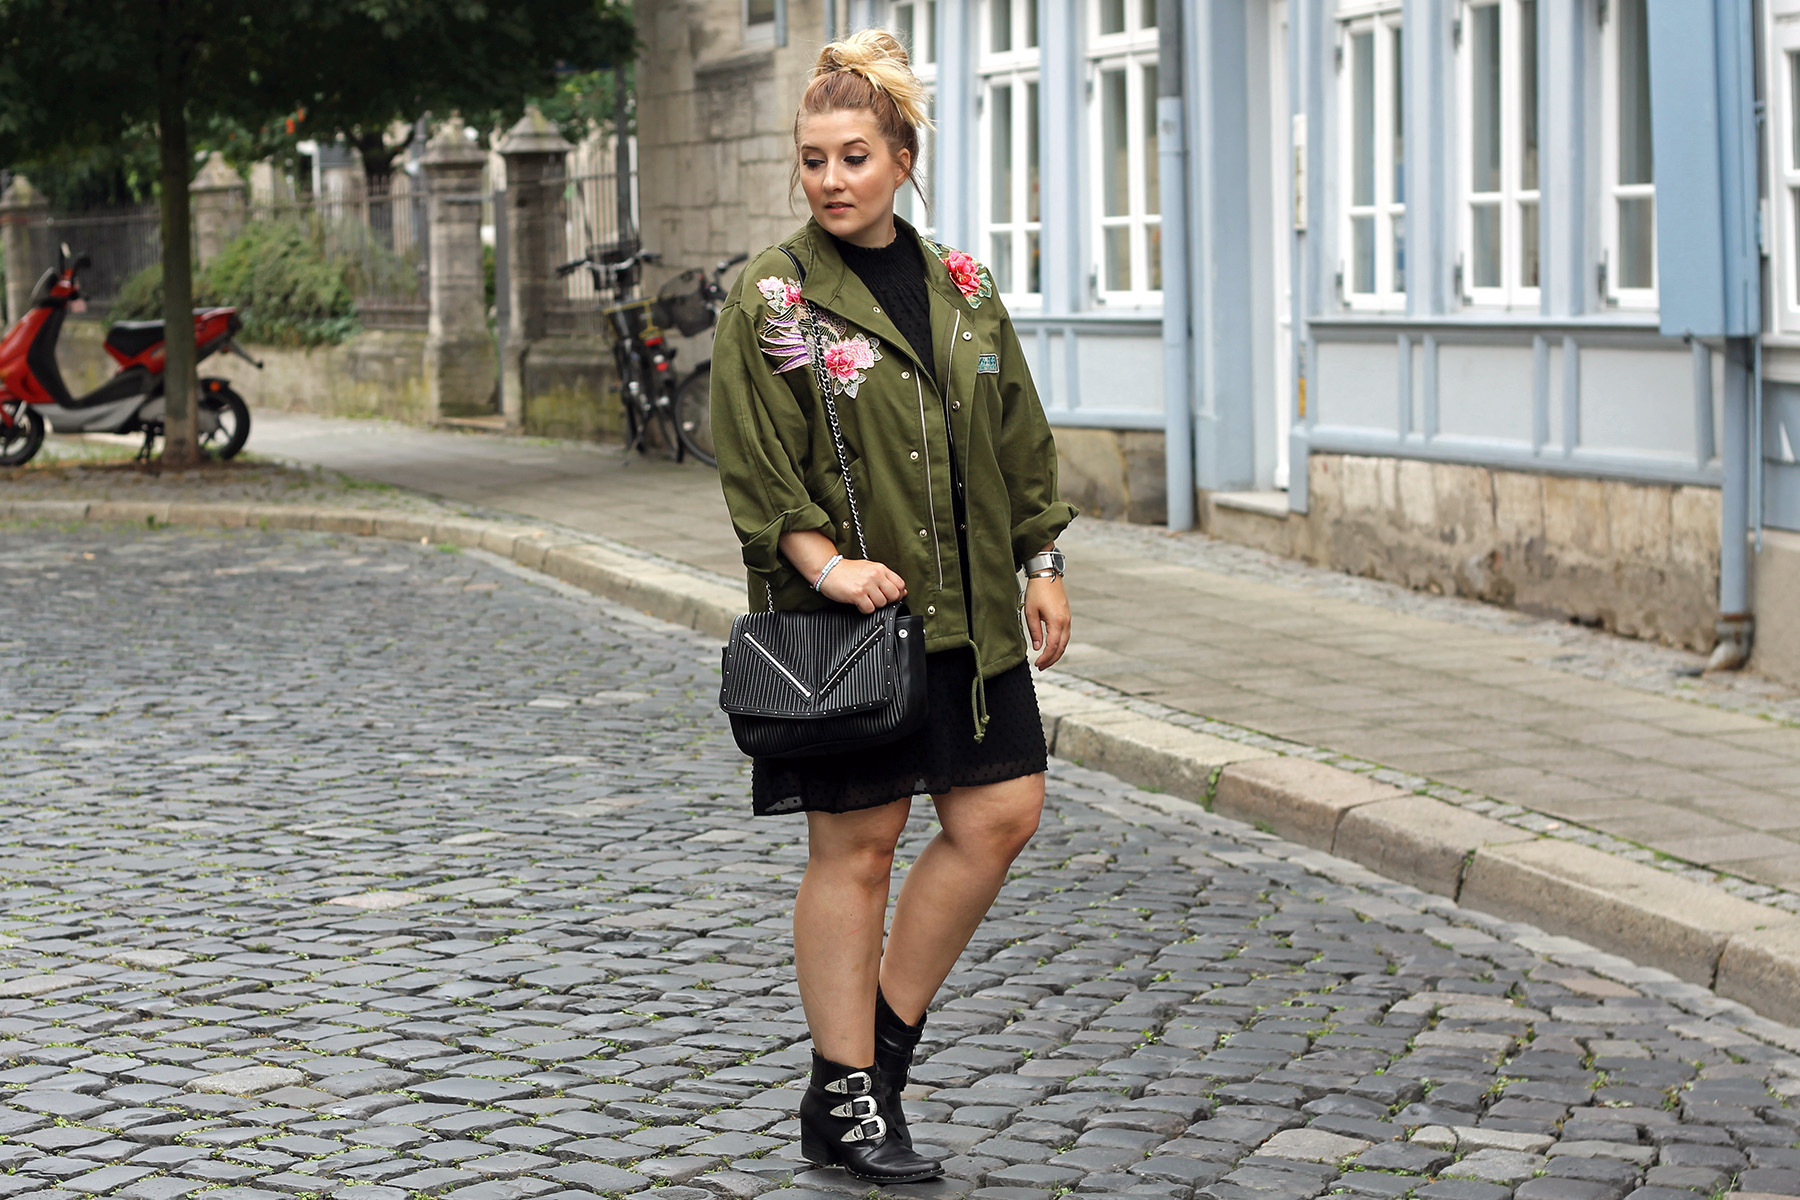 outfit-look-style-modeblog-fashionblog-deutschland-top-fashionpassionlove-zara-parka-jacke-rosen16